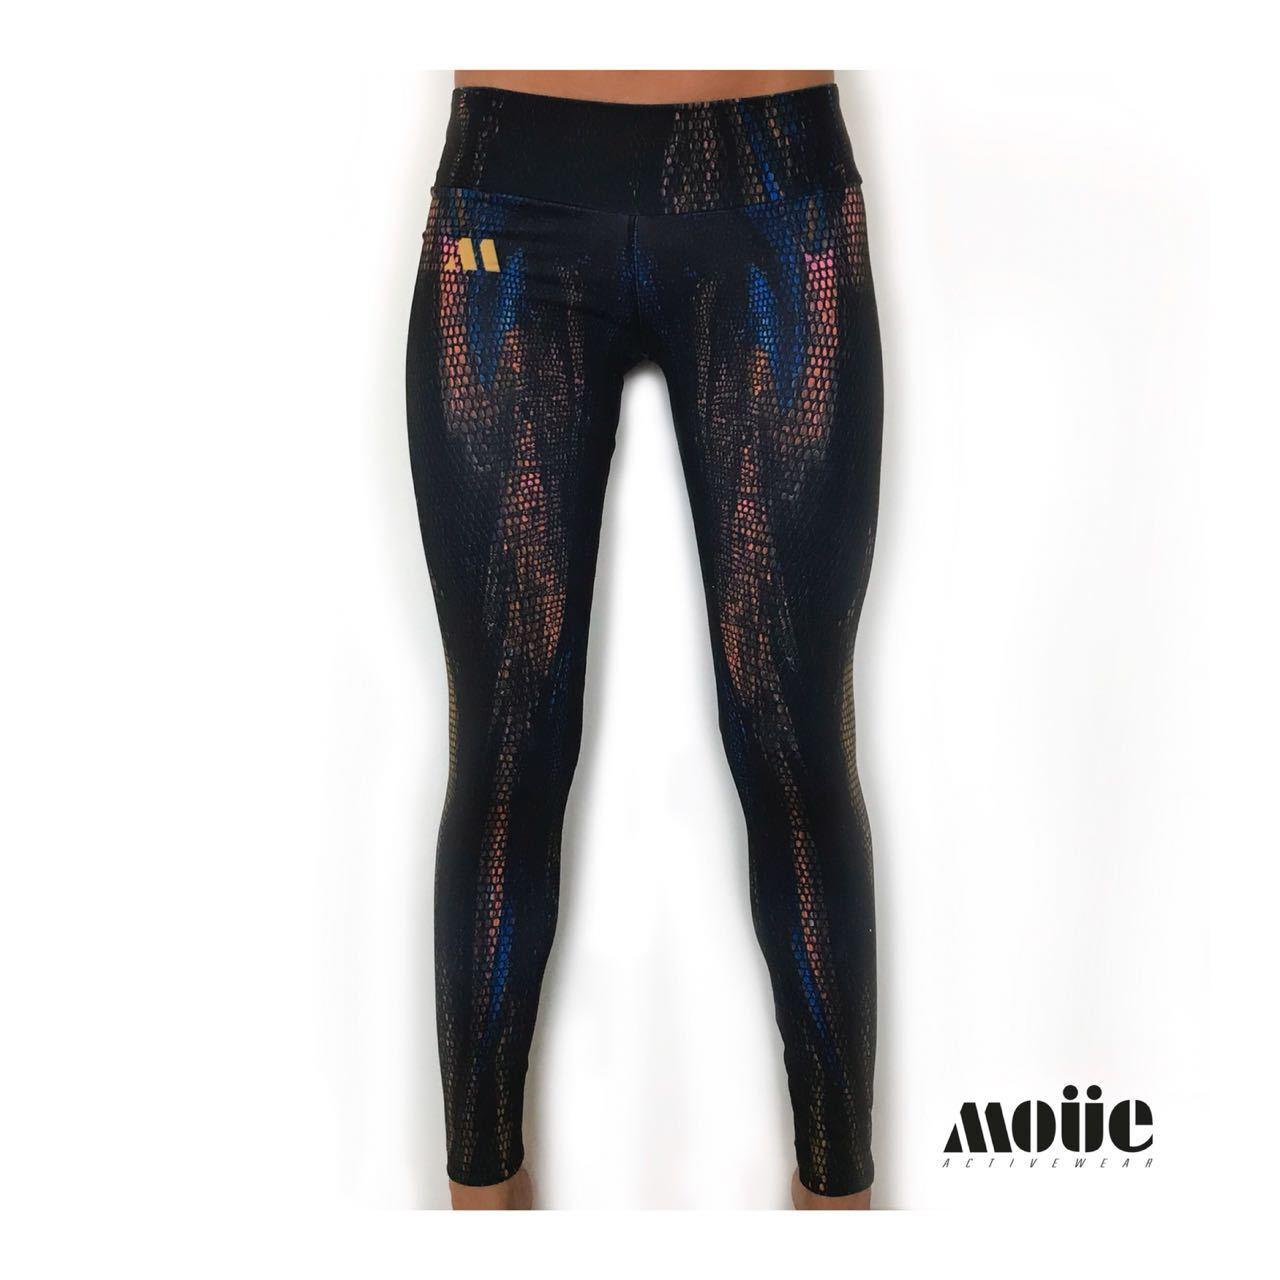 Women Fitness Leggings  Yoga Pants Ladies Running Gym Exercise Sports Trousers